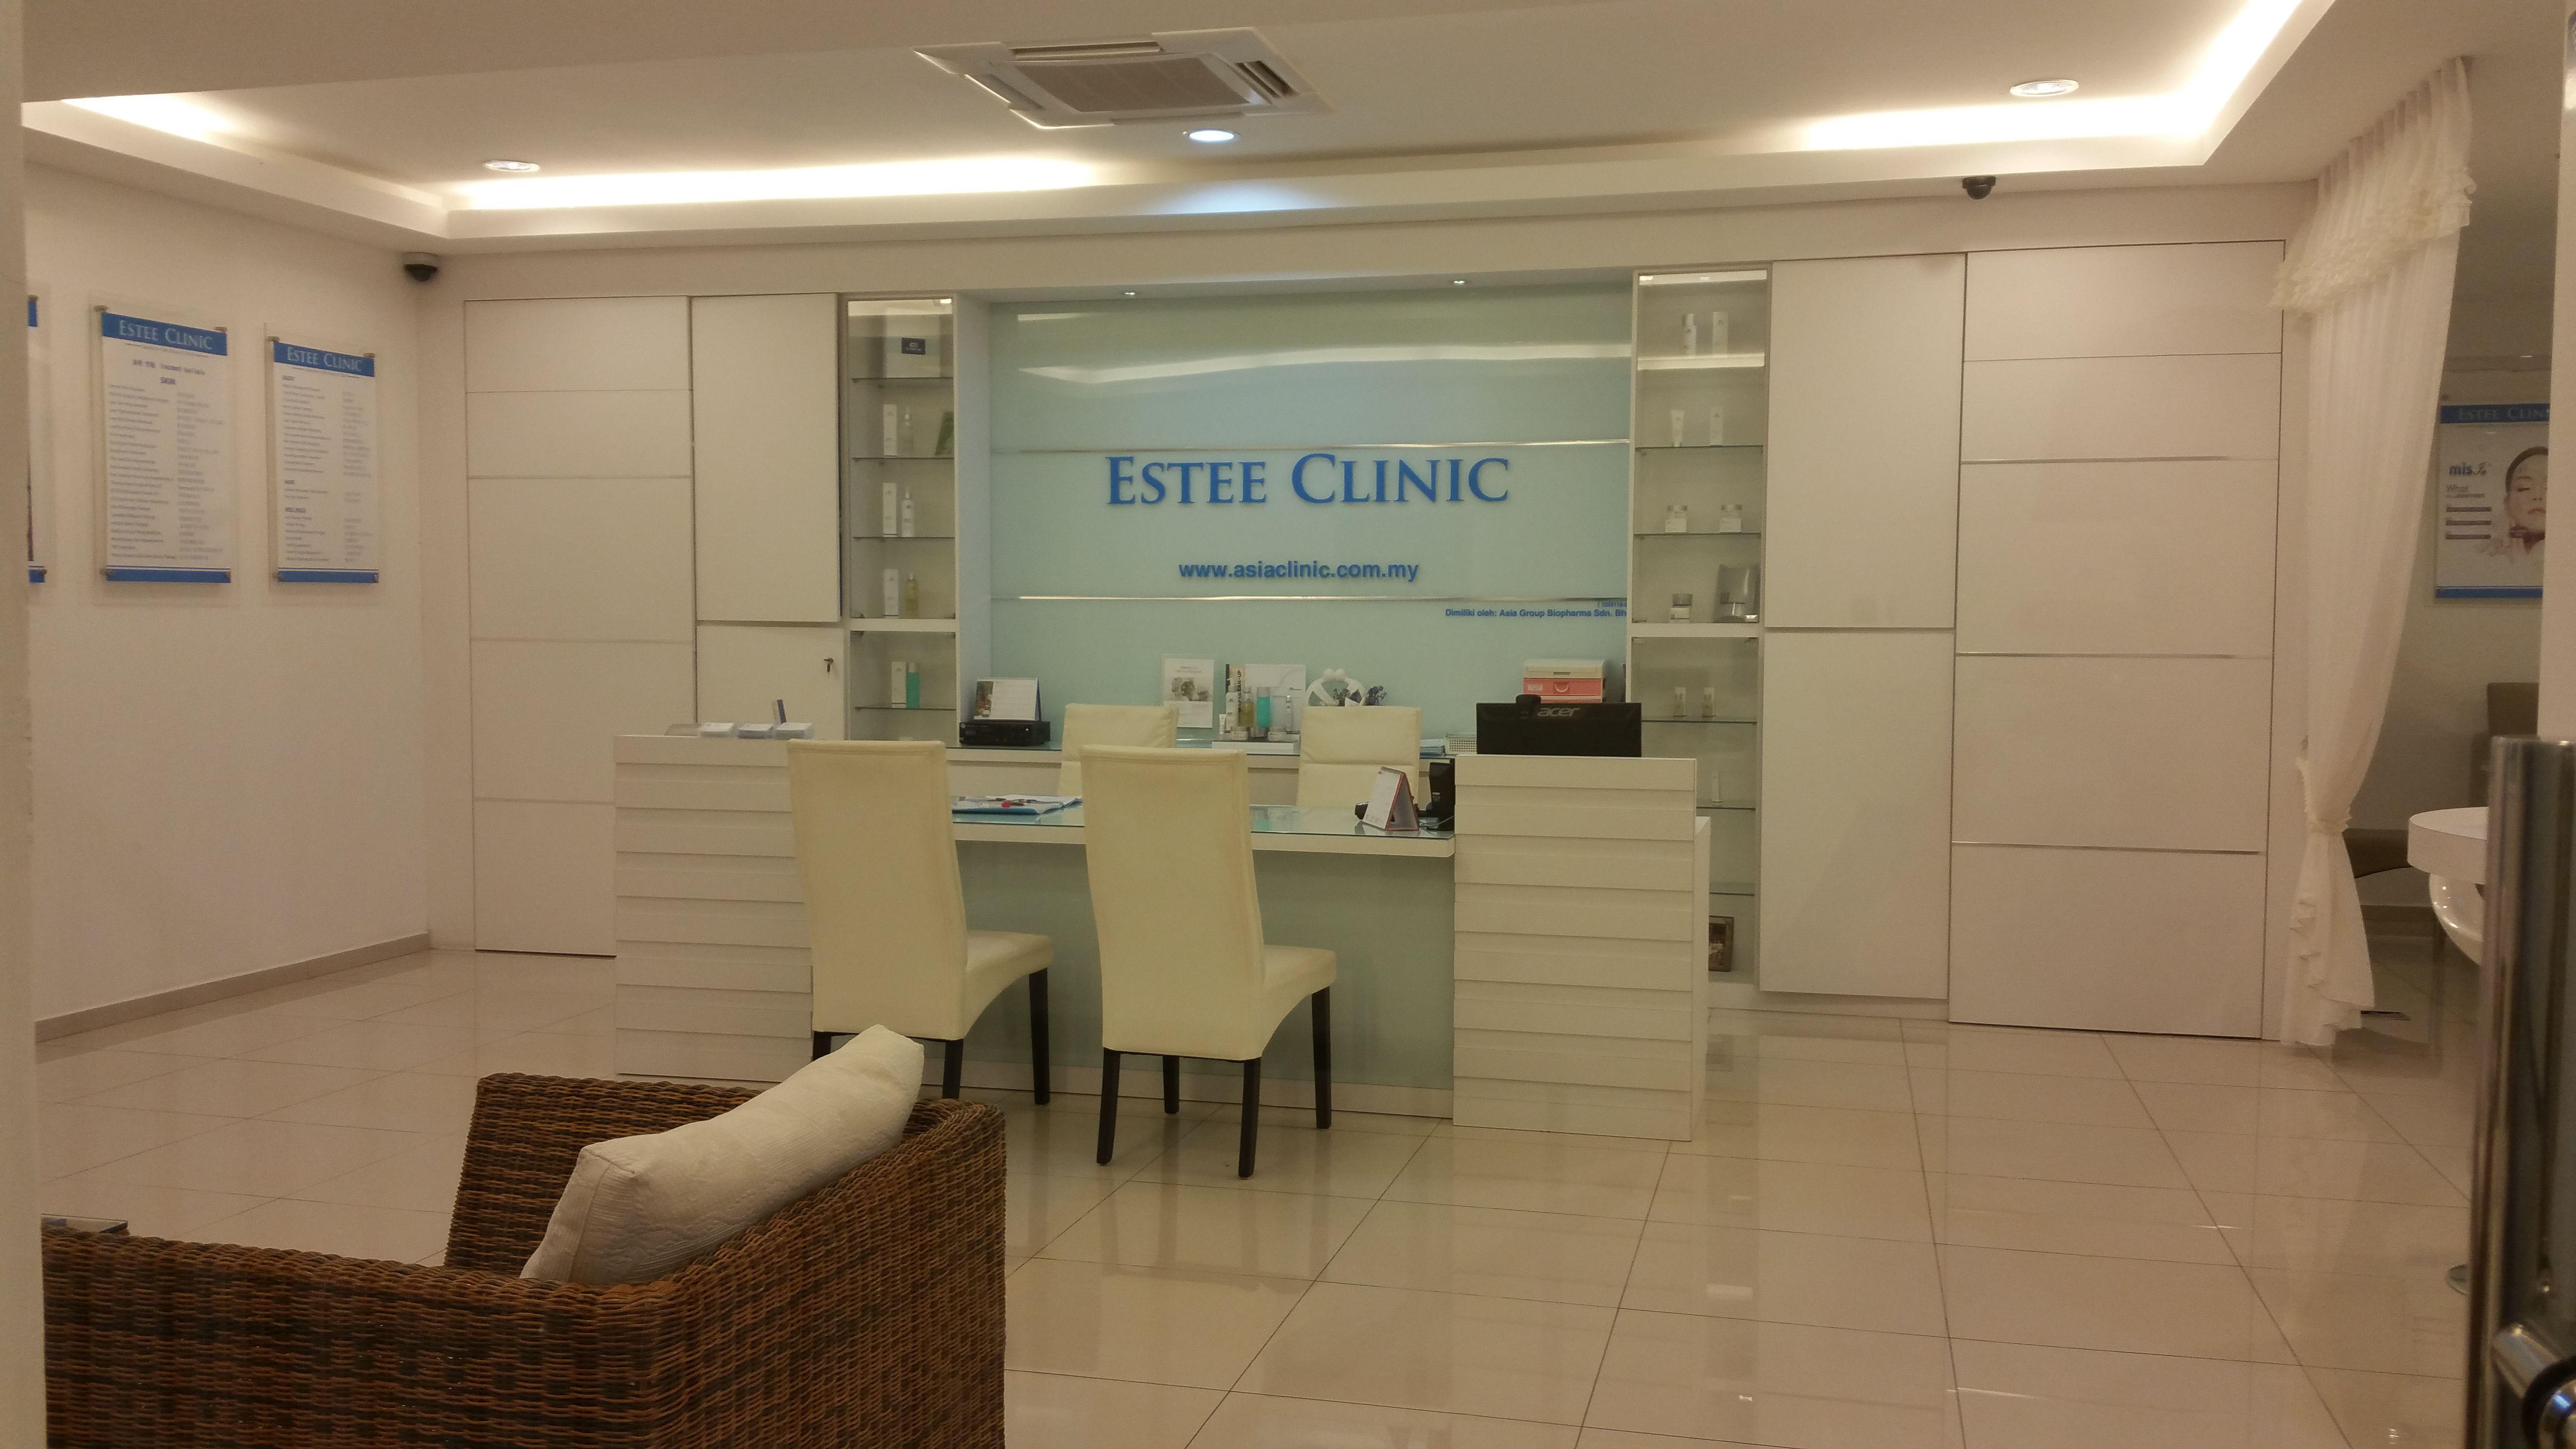 Estee Clinic - (Muar HQ)